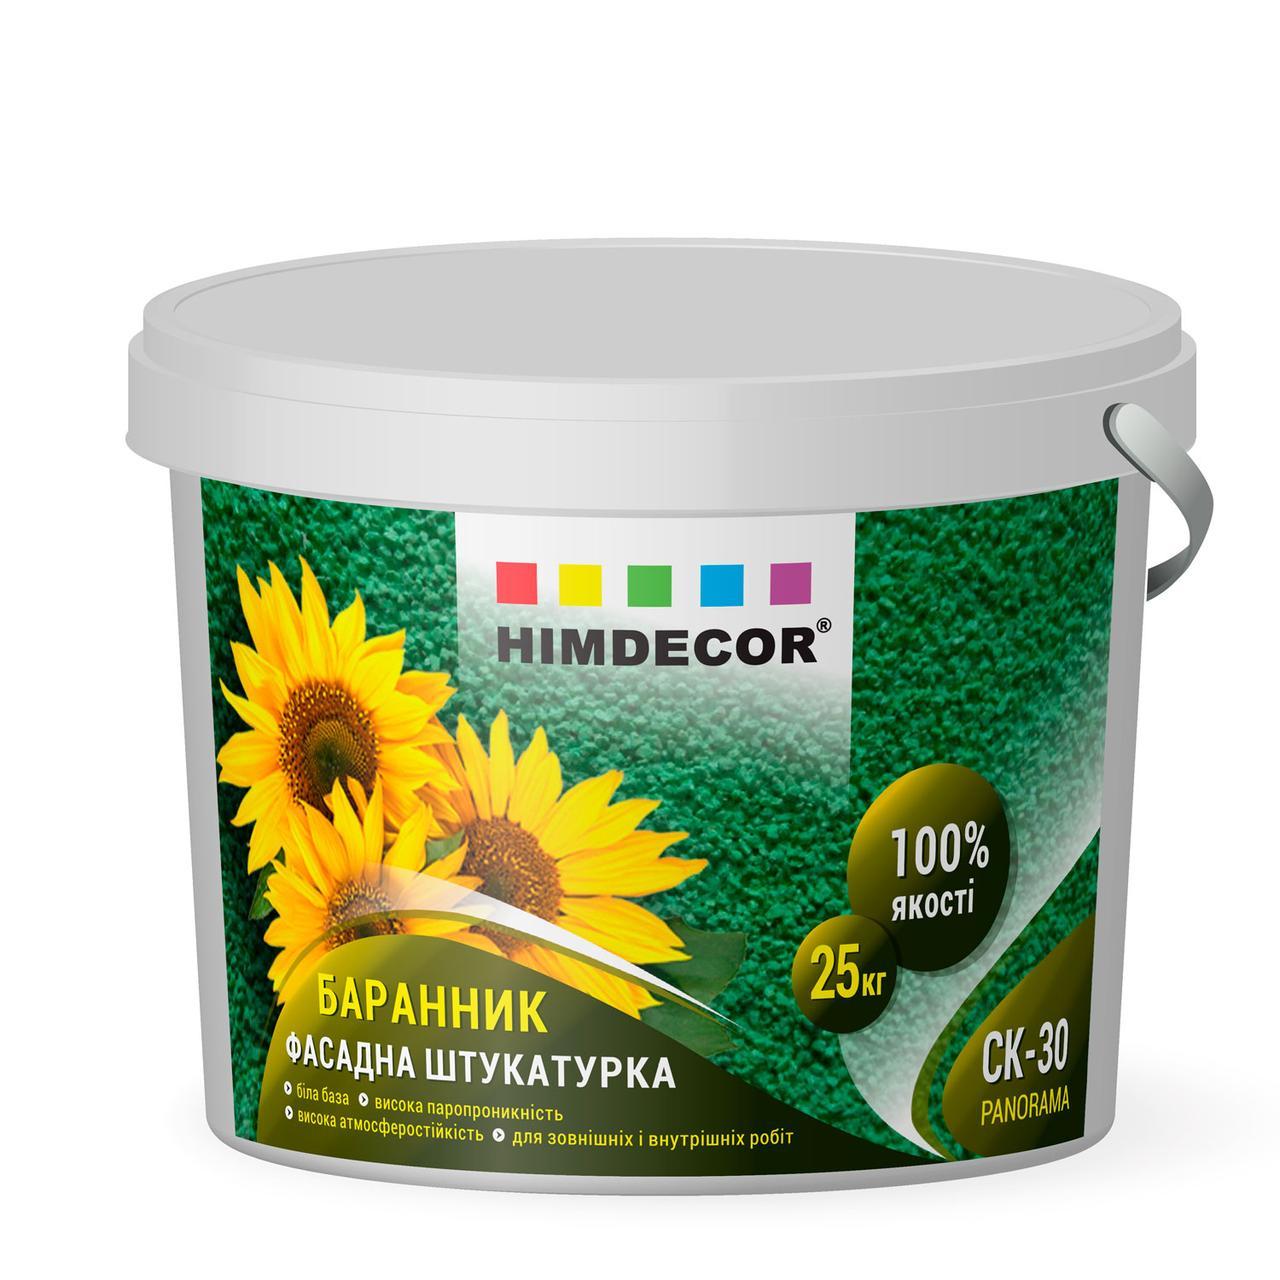 Штукатурка фасадна Баранник Himdecor 1.5мм - 25 кг